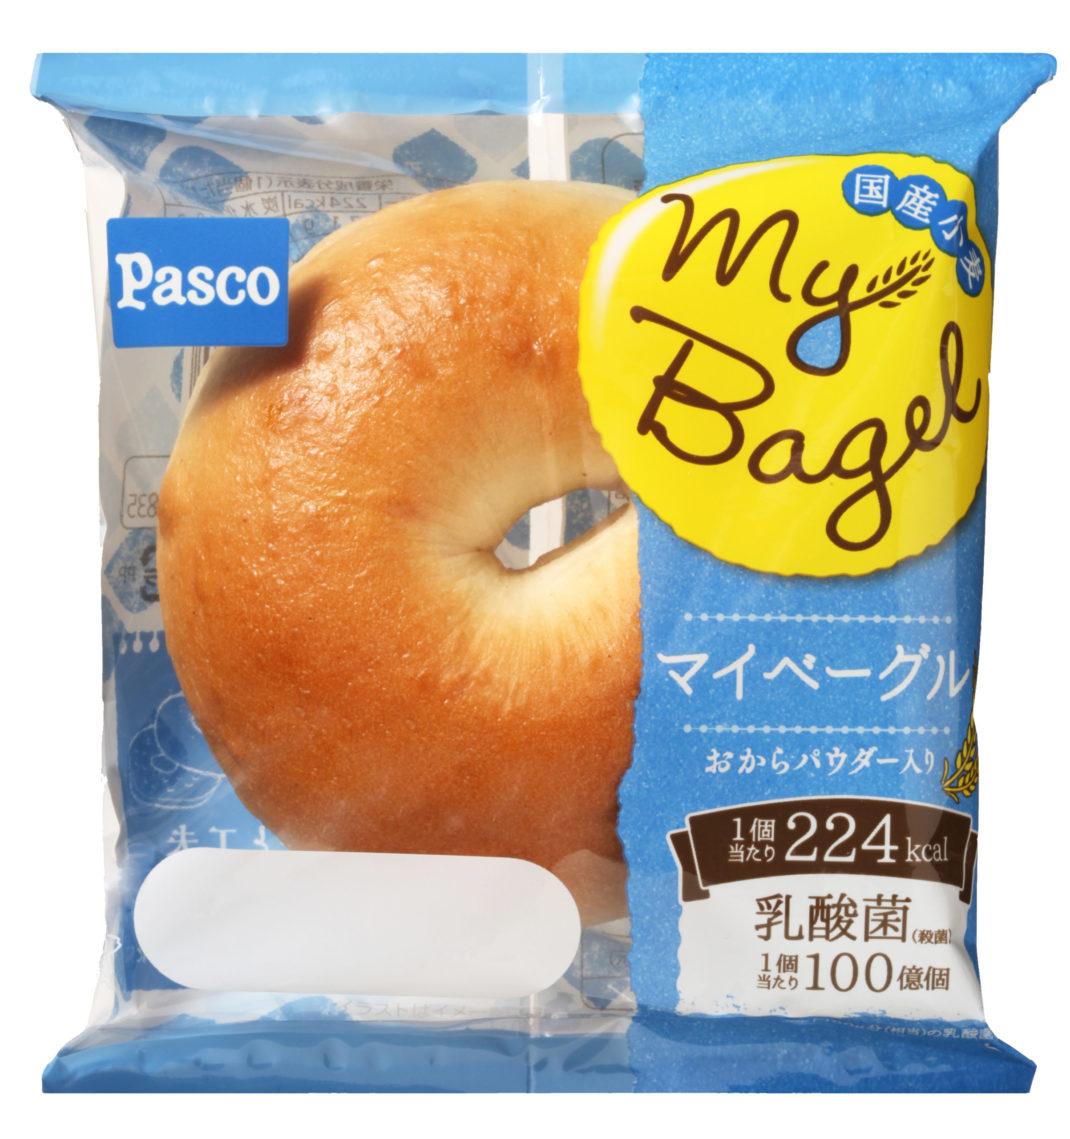 PascoのMy Bagelに新ベーグル登場★限定商品も!カロリーは?